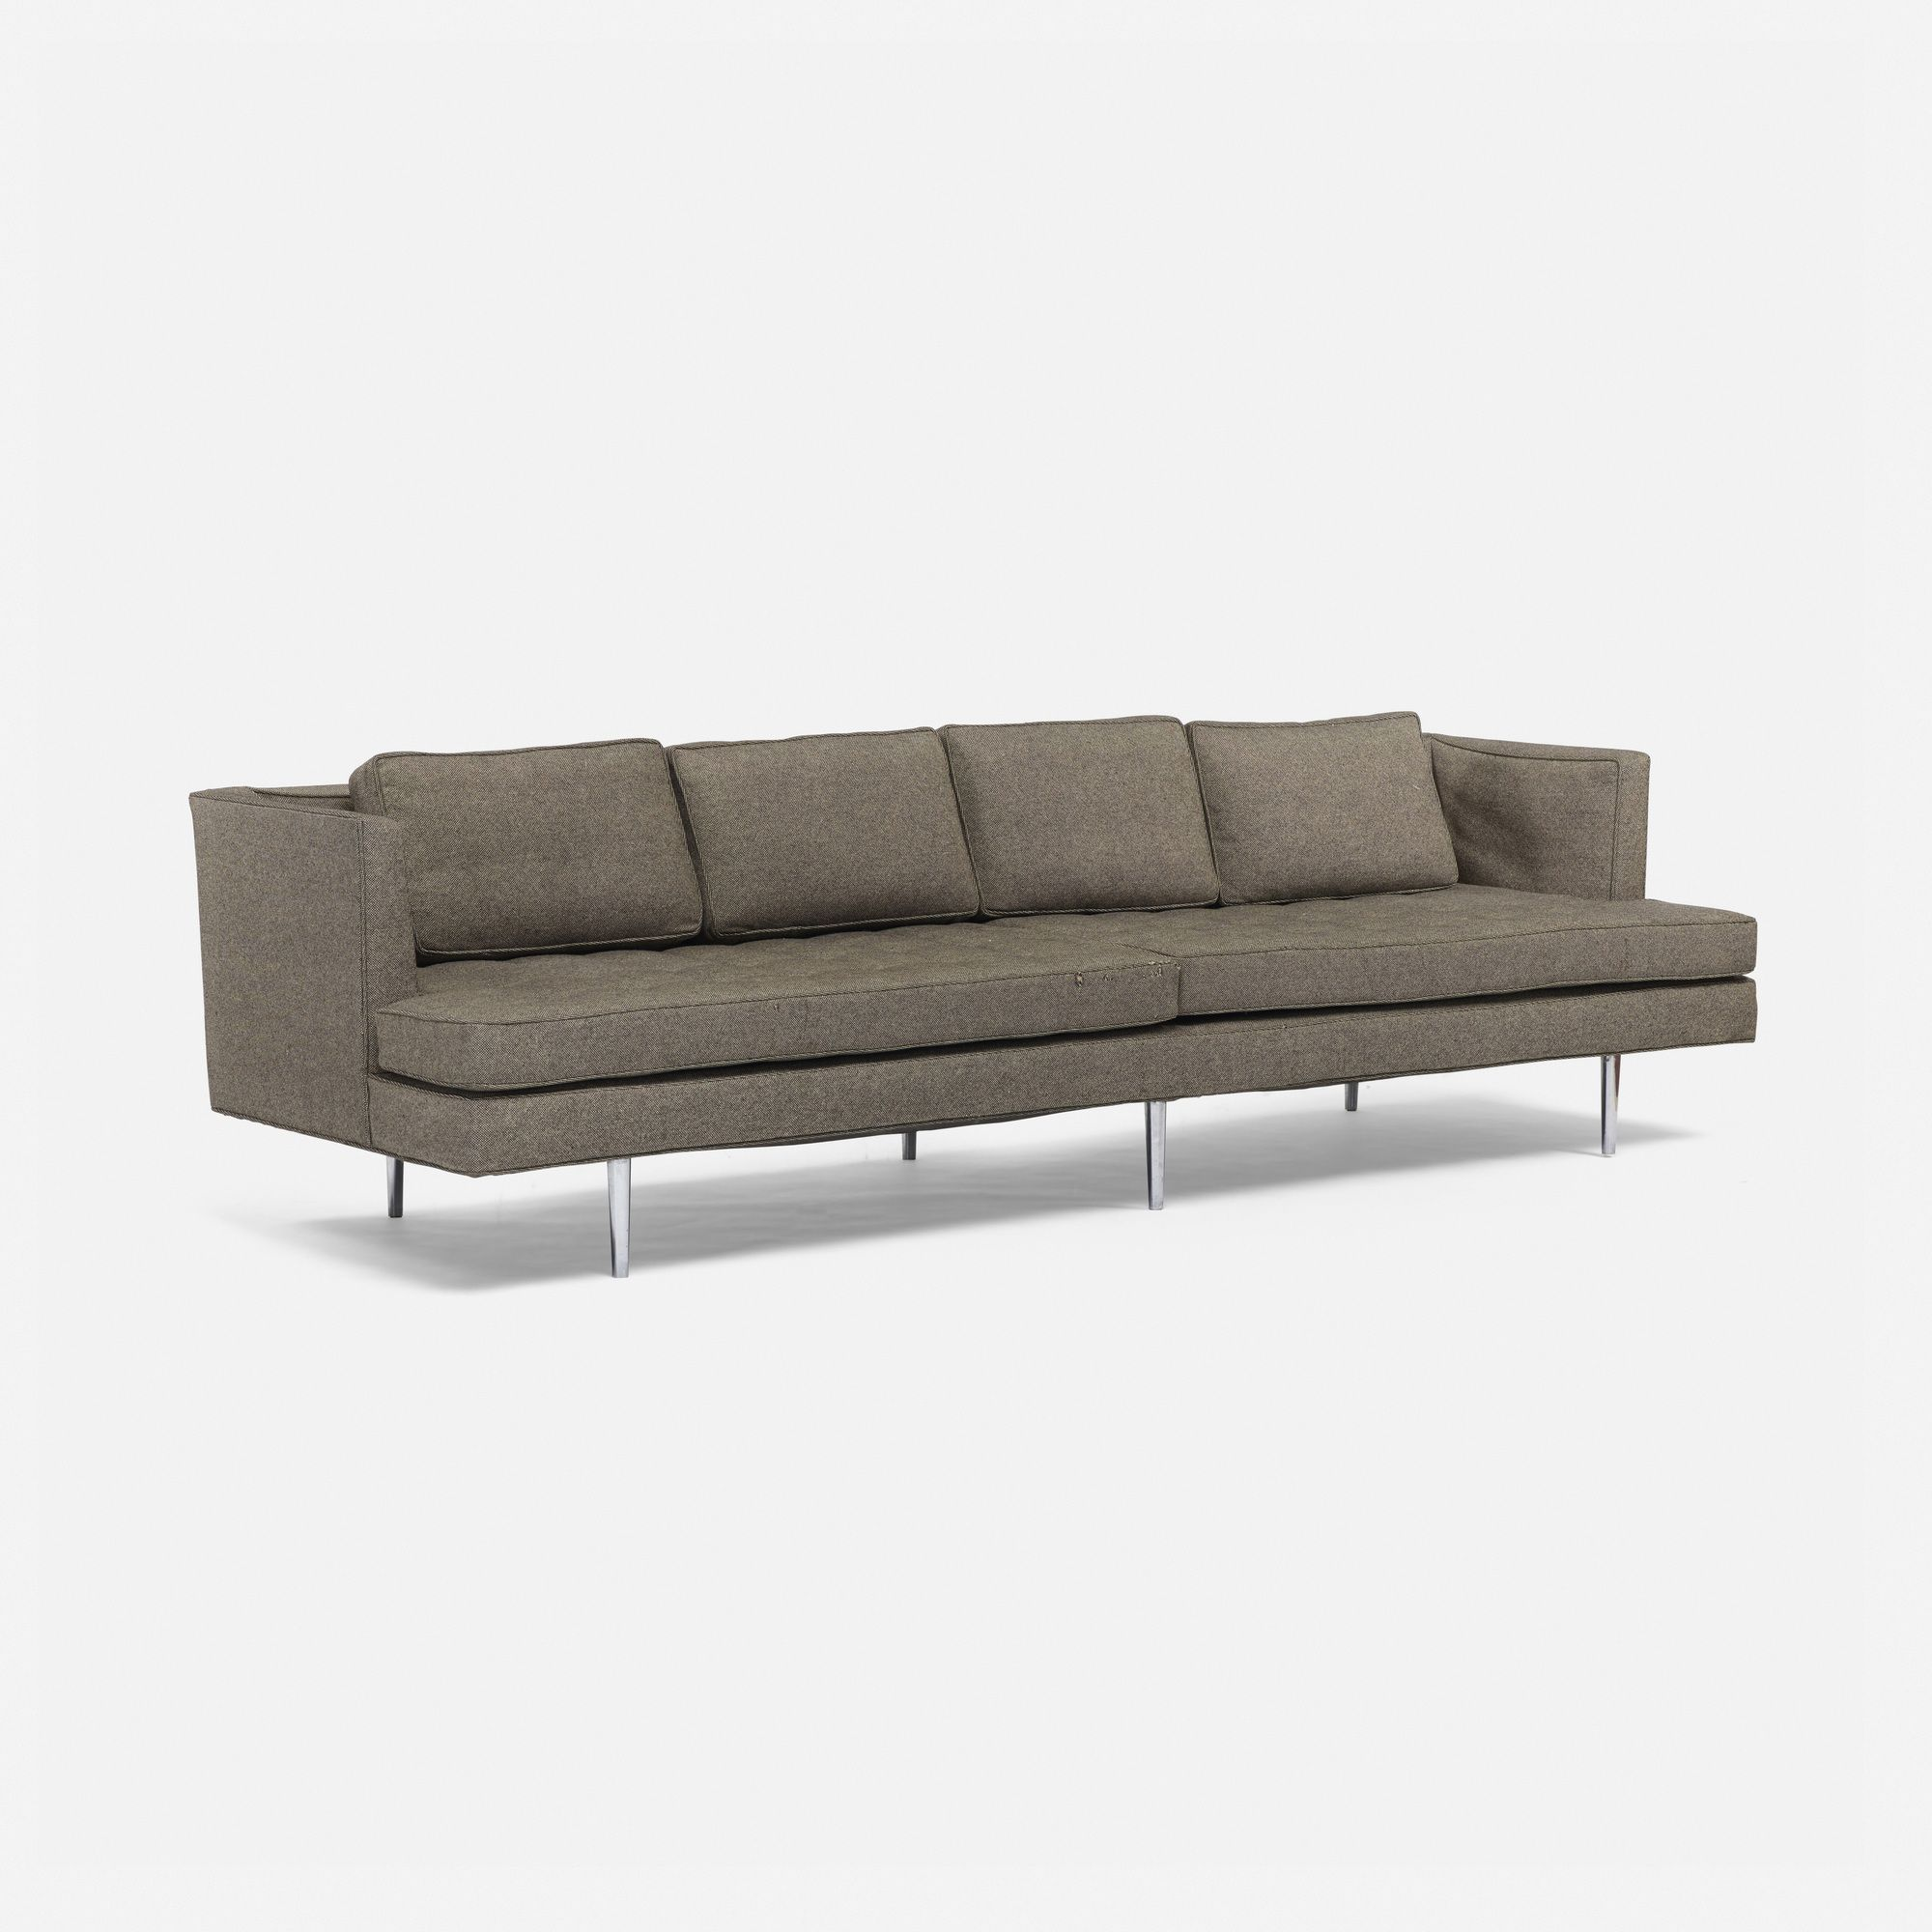 Lot 711: Edward Wormley. Sofa, Model 4907A. 1956, Upholstery, Chrome